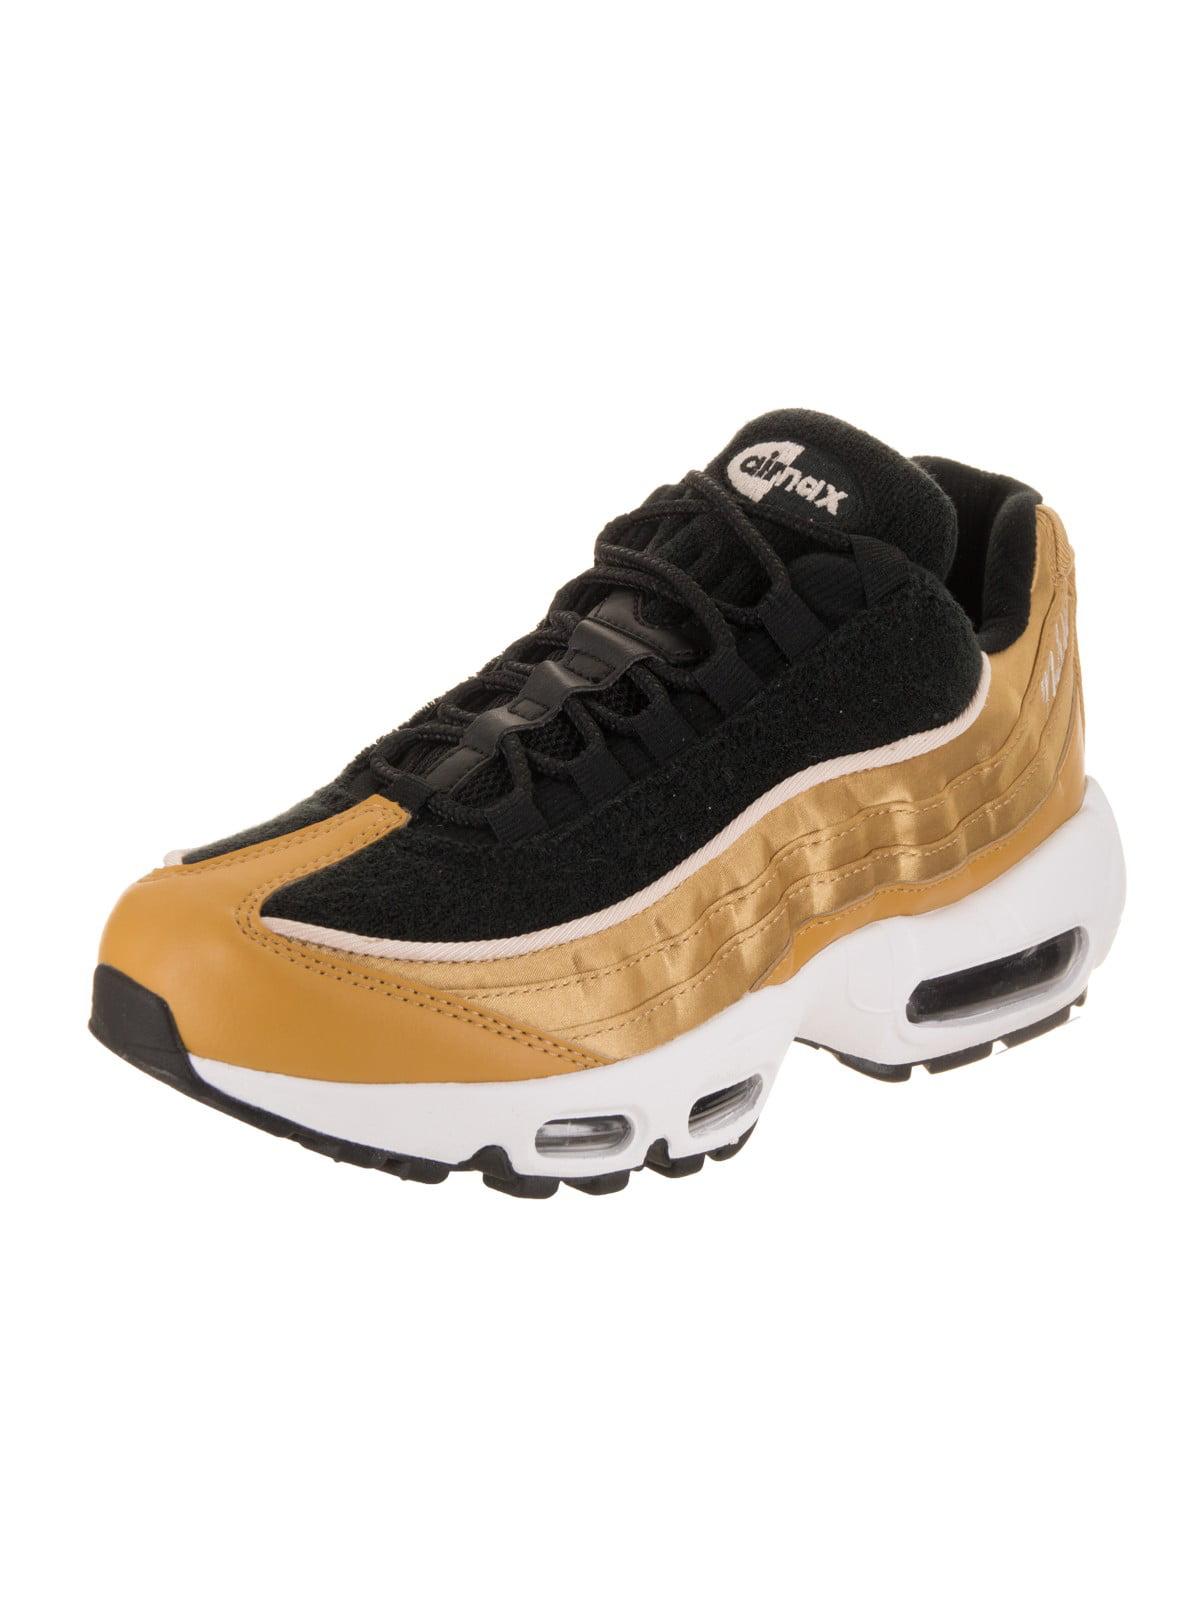 best cheap 5b3fb 70e29 Nike Women s Air Max 95 LX Running Shoe